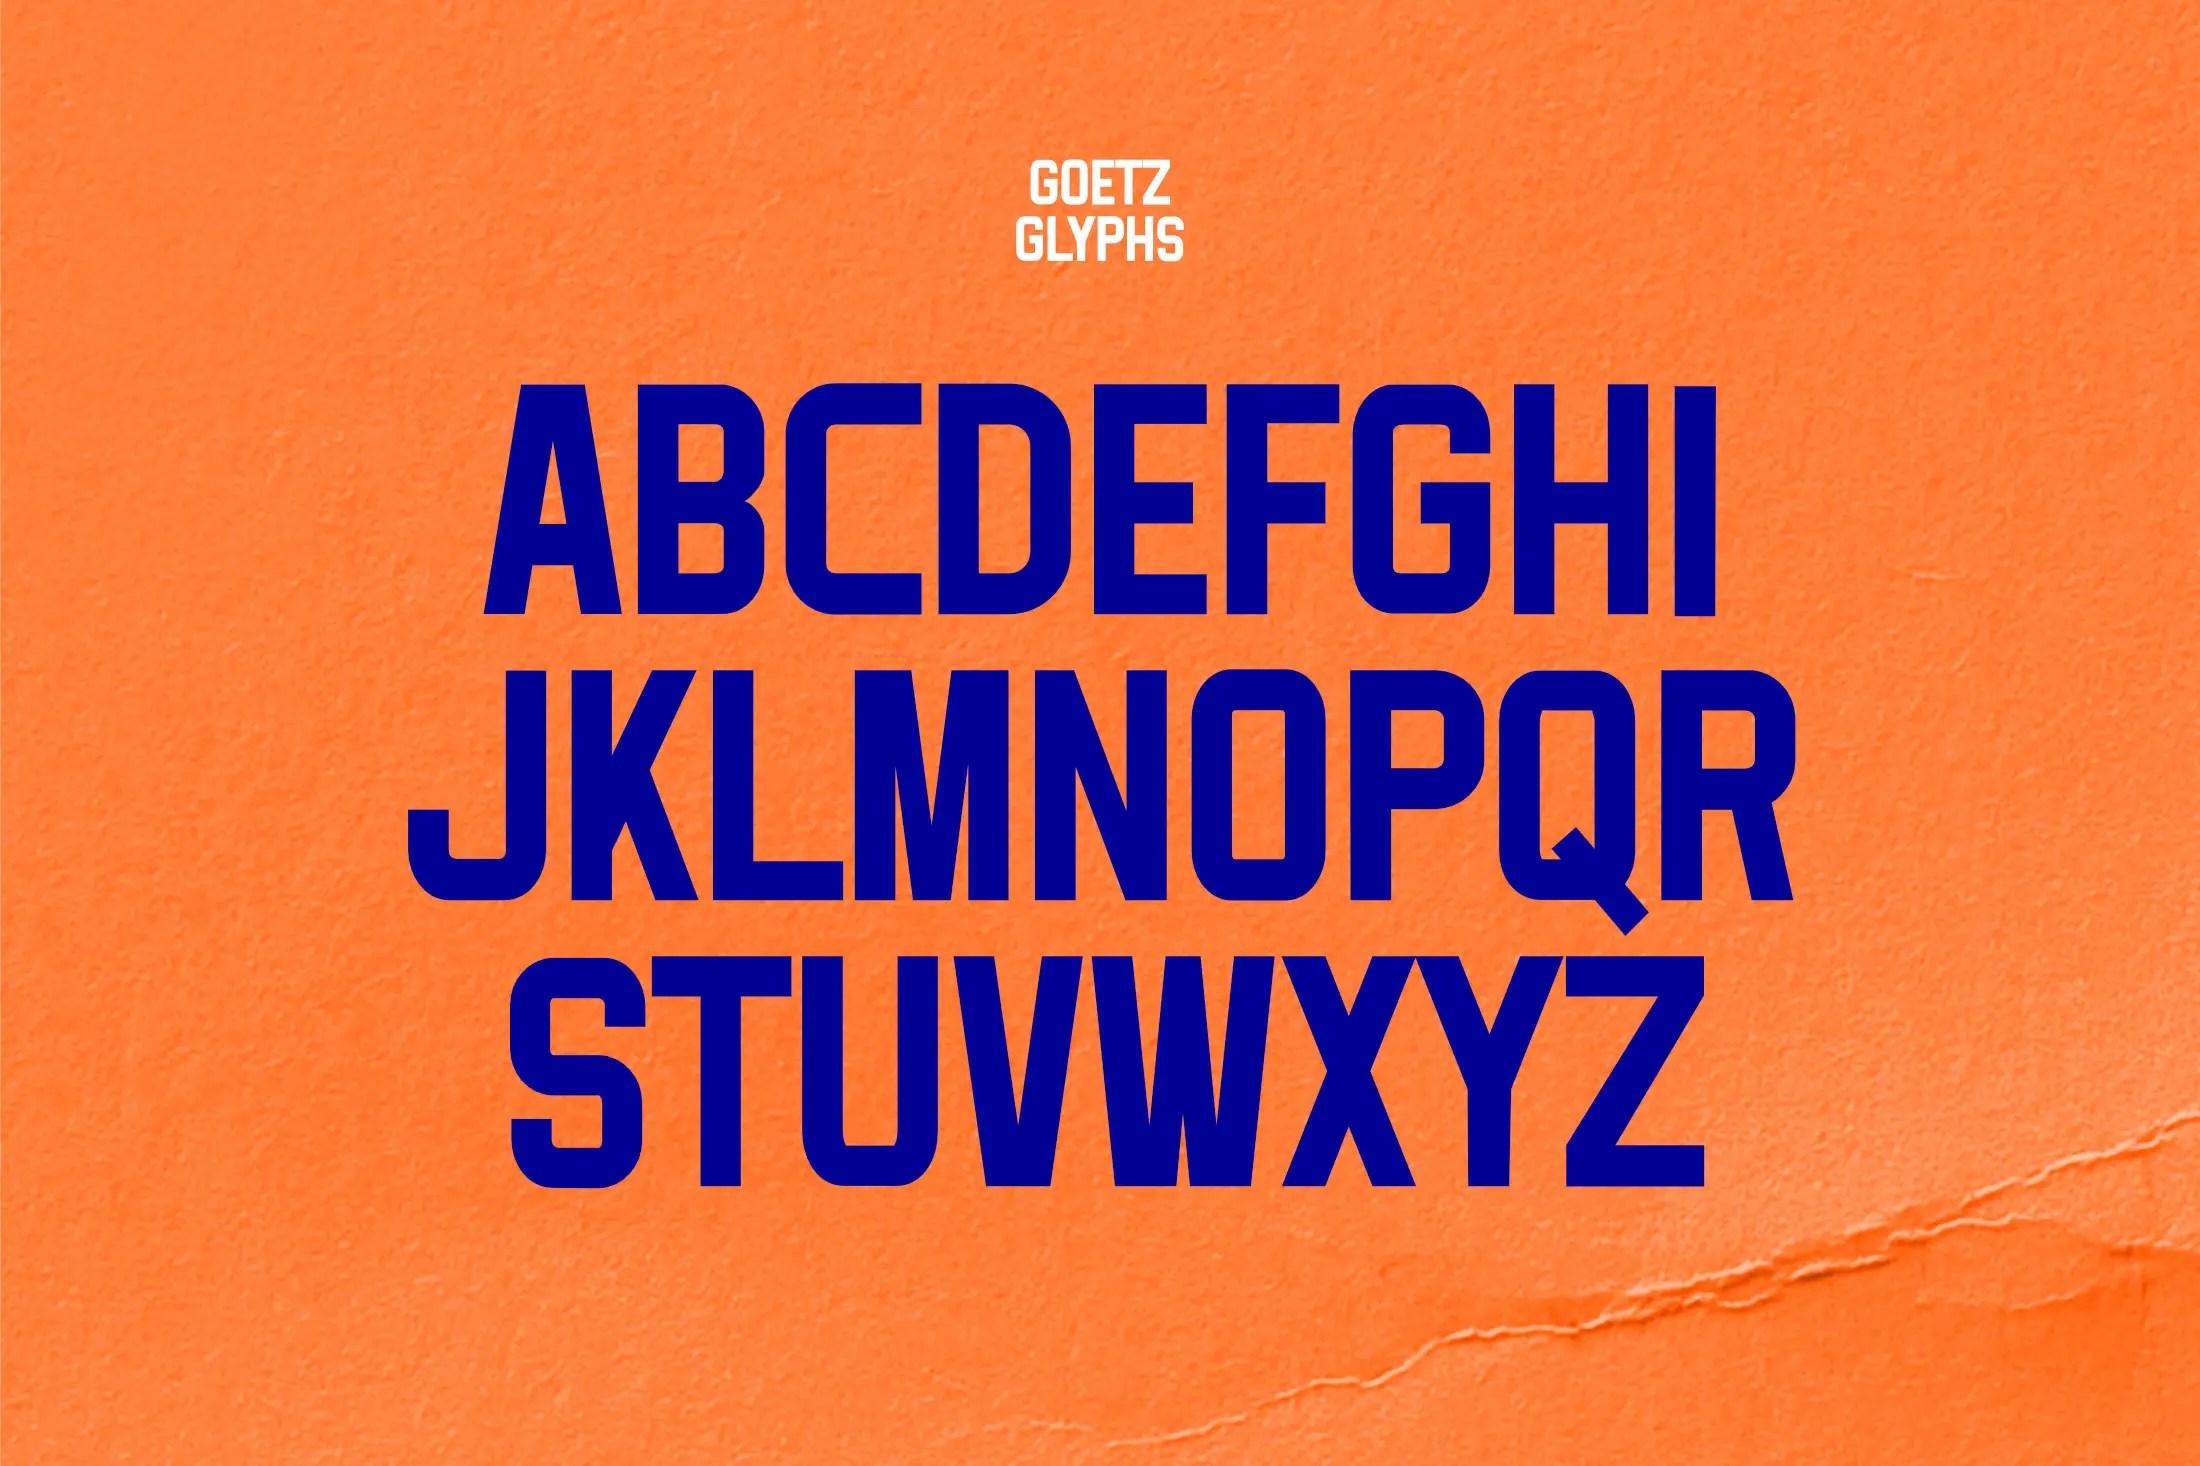 Goetz Modern Sans Serif F2nt -1